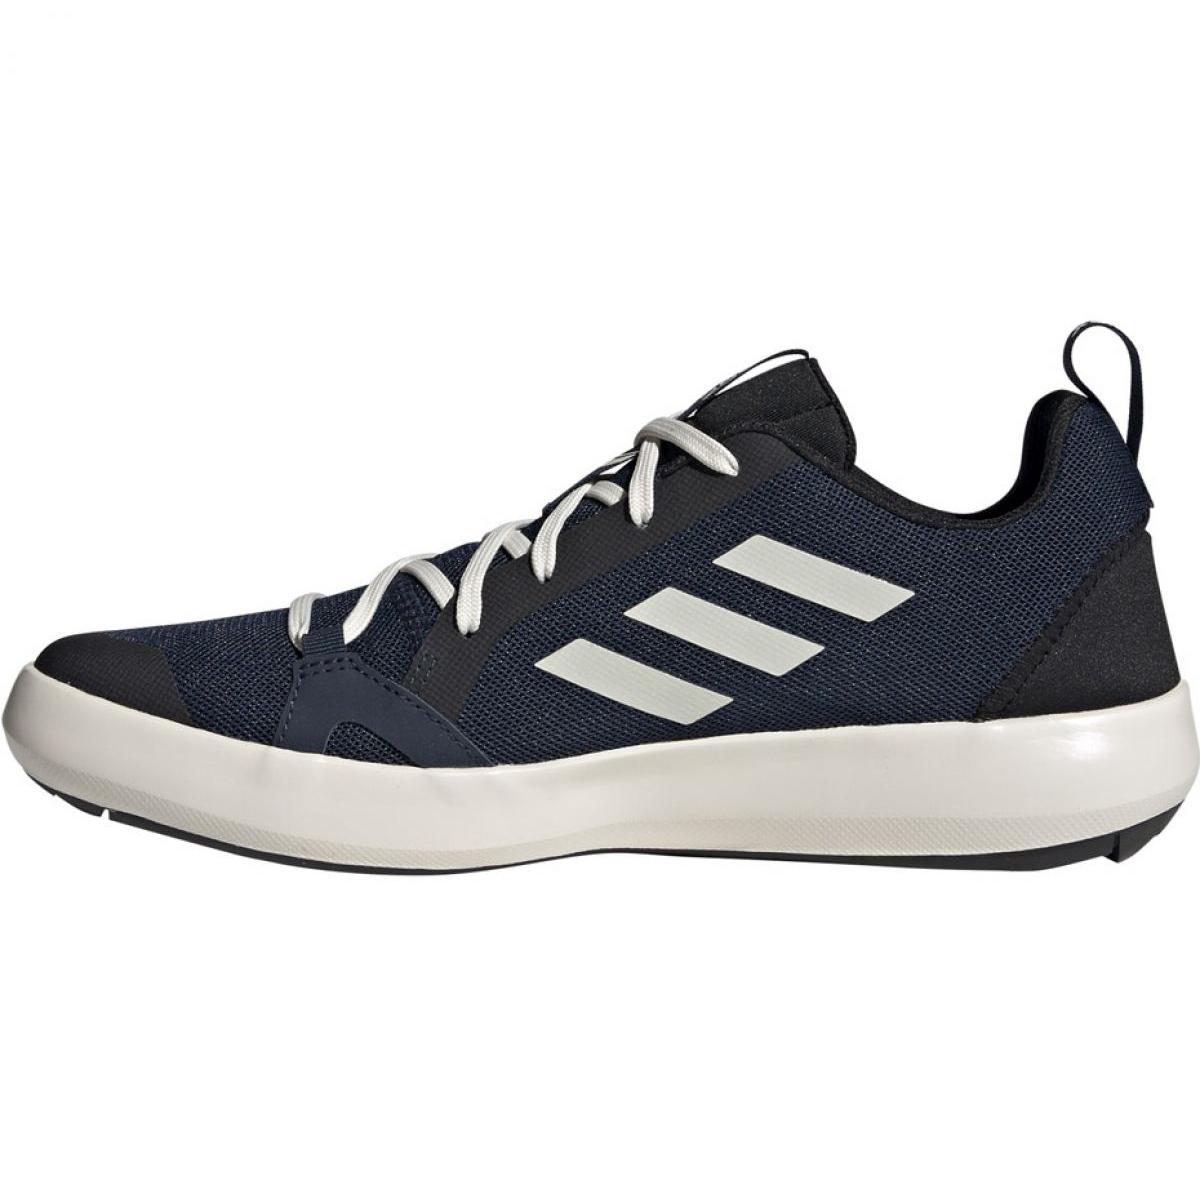 Terrex Chaussures Bc0507 Boat M Marine Cc Adidas 3jqLAR45